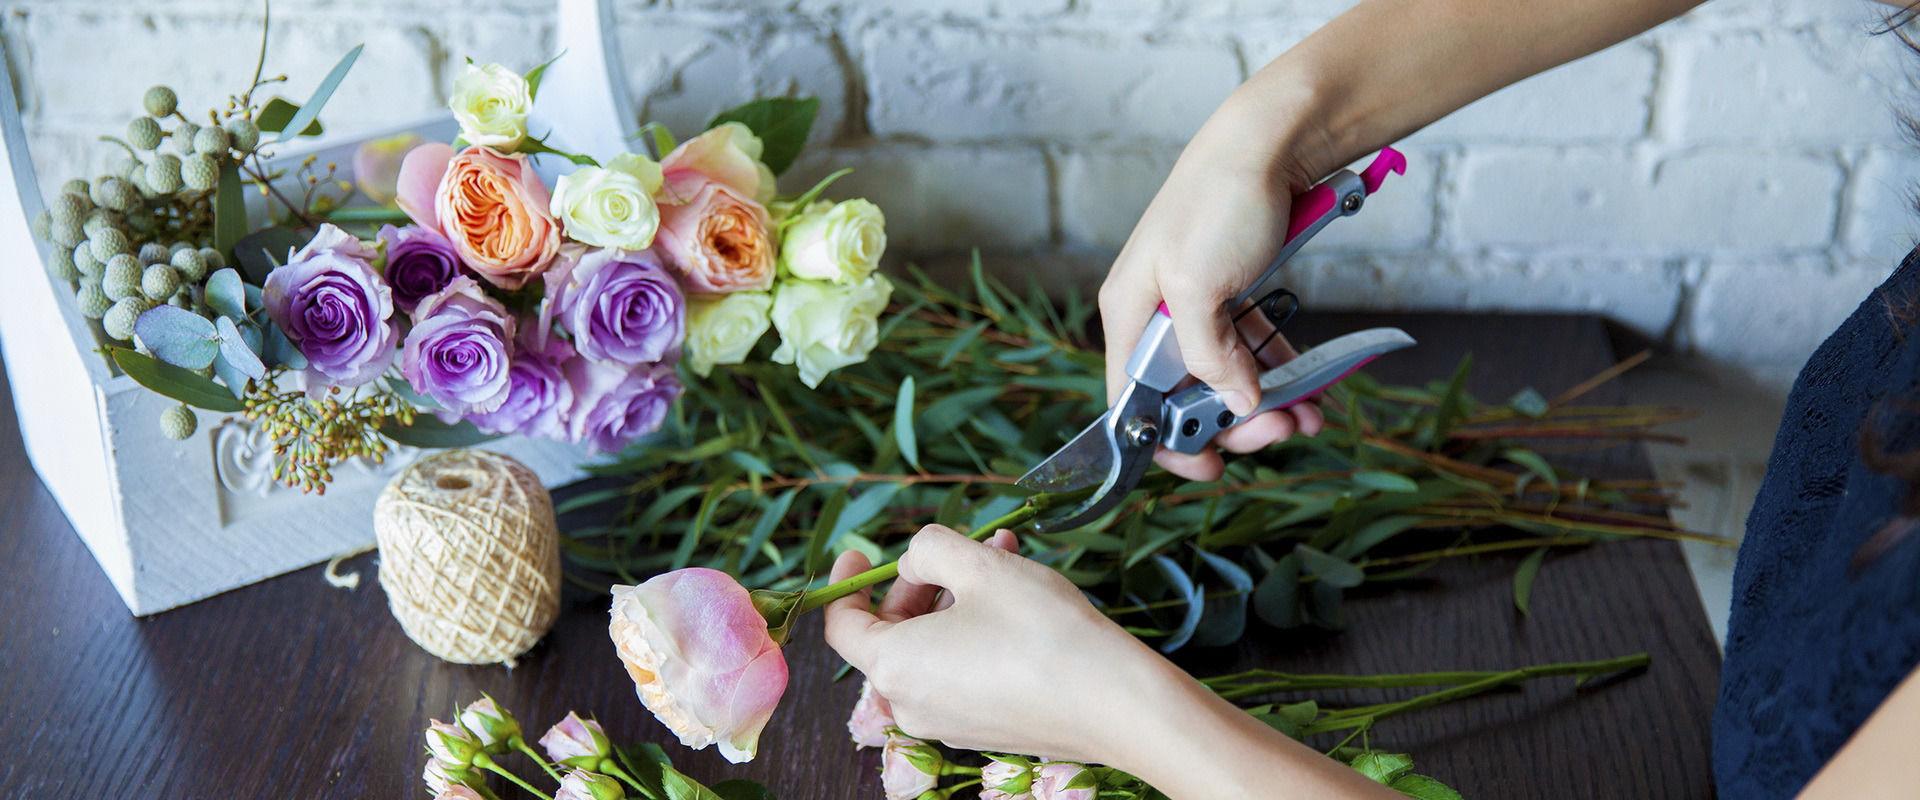 Изучение индустрии флористики